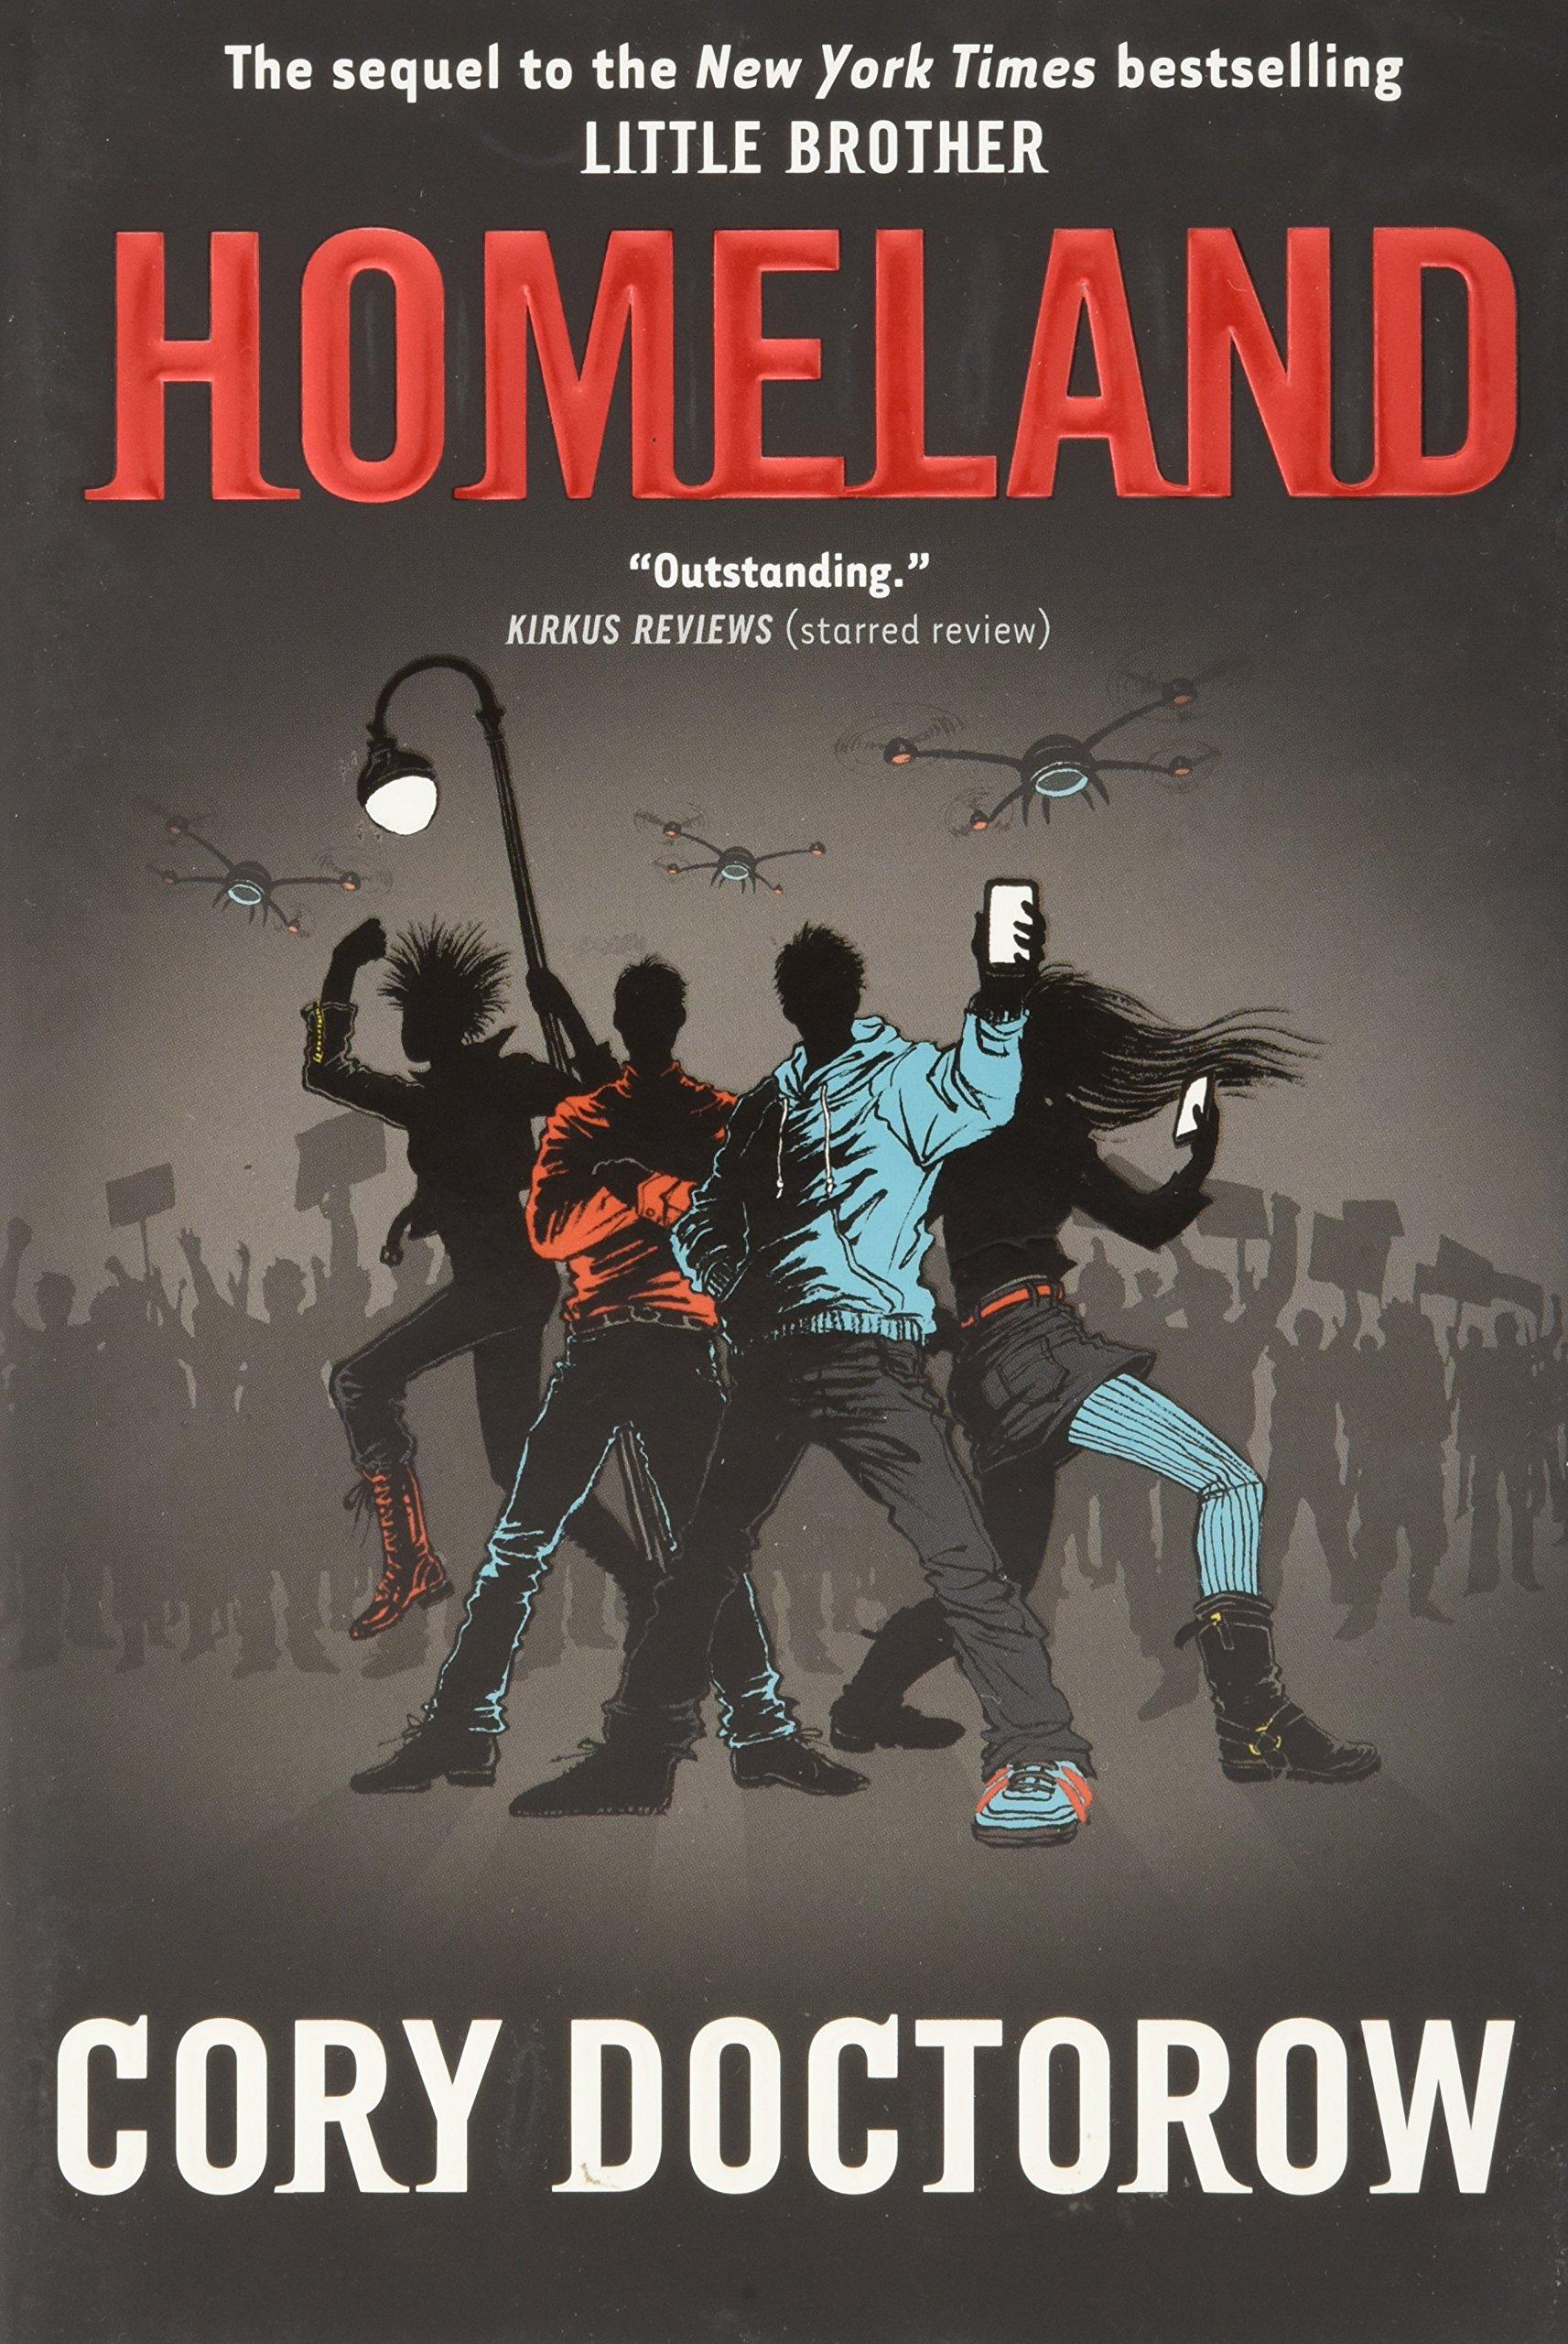 Homeland (Anglais) Relié – 5 février 2013 Cory Doctorow Tor Book 0765333694 Kinder- und Jugendbücher